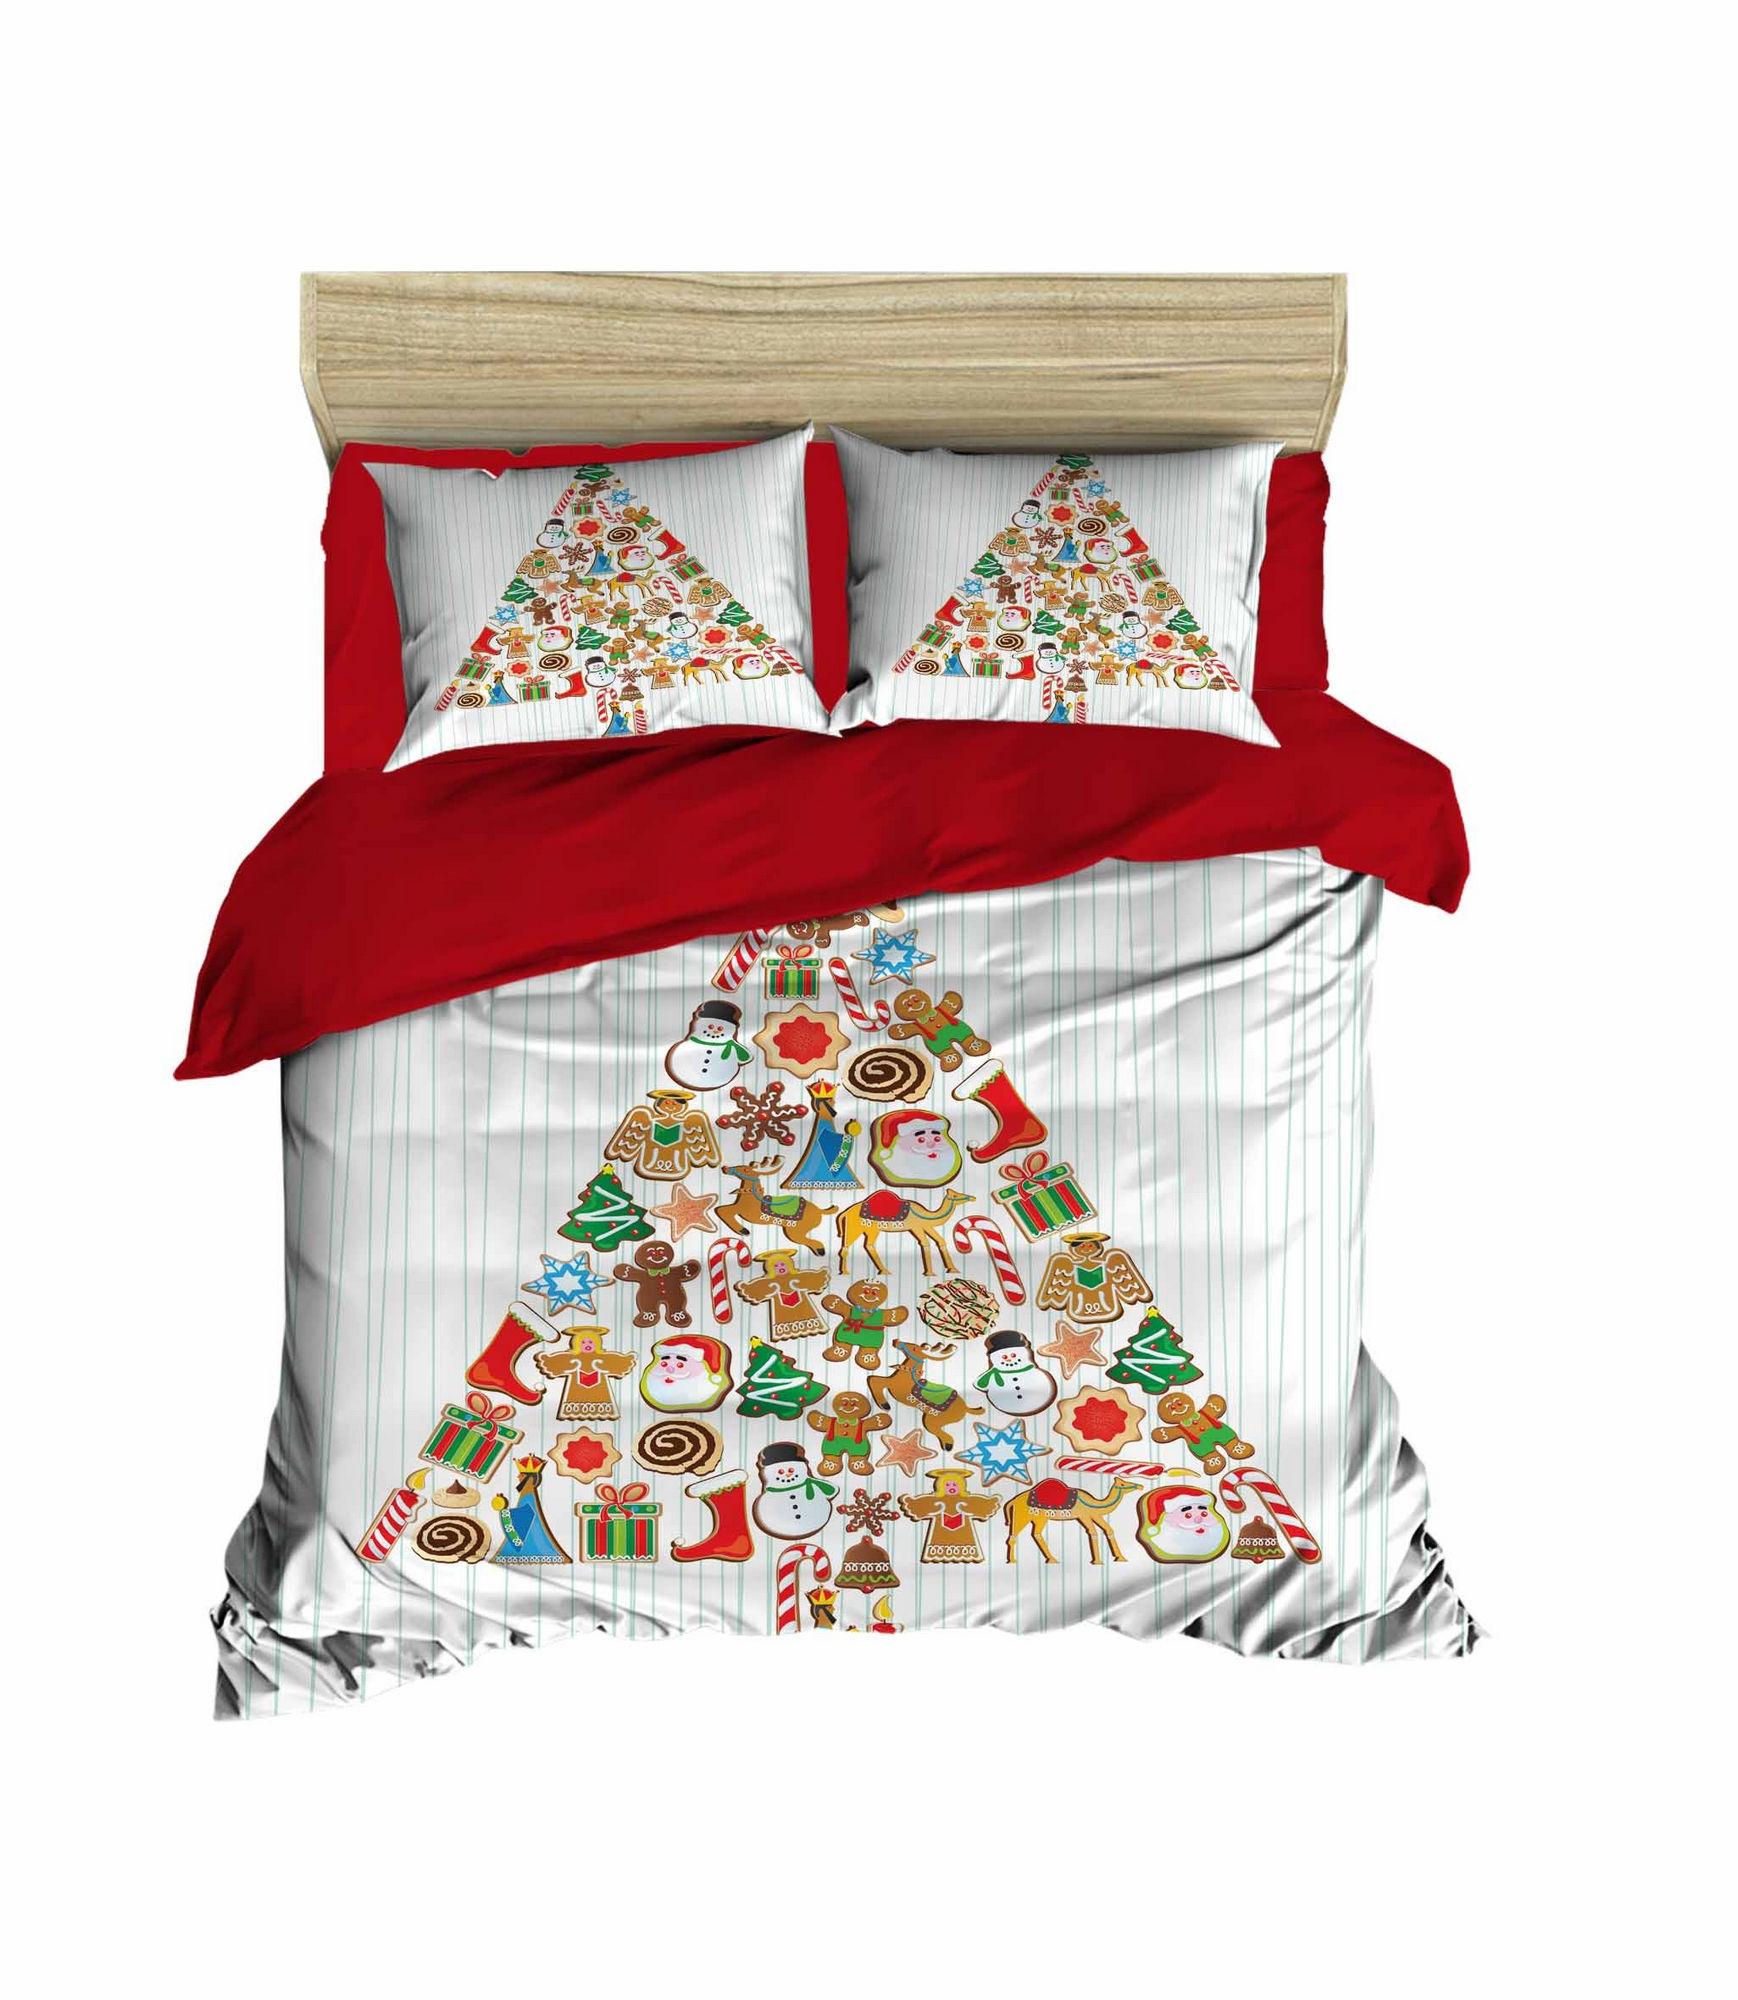 Lenjerie de pat din bumbac si microfibra Christmas 446 Multicolor, 200 x 220 cm imagine